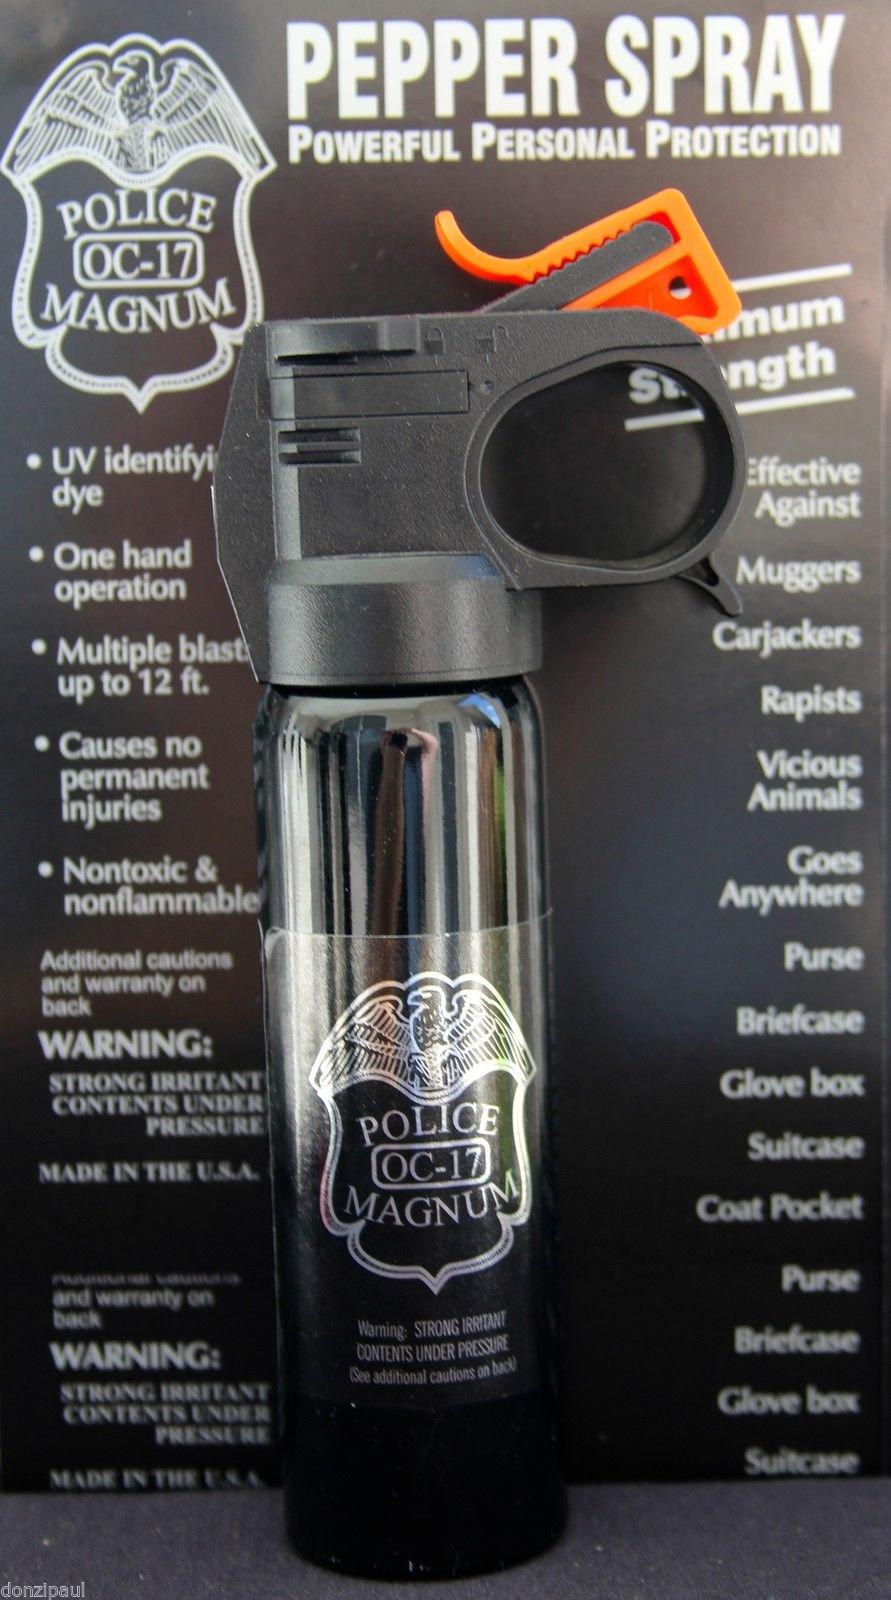 Police Magnum Mace Pepper Spray 4 Oz Fire Master Unit